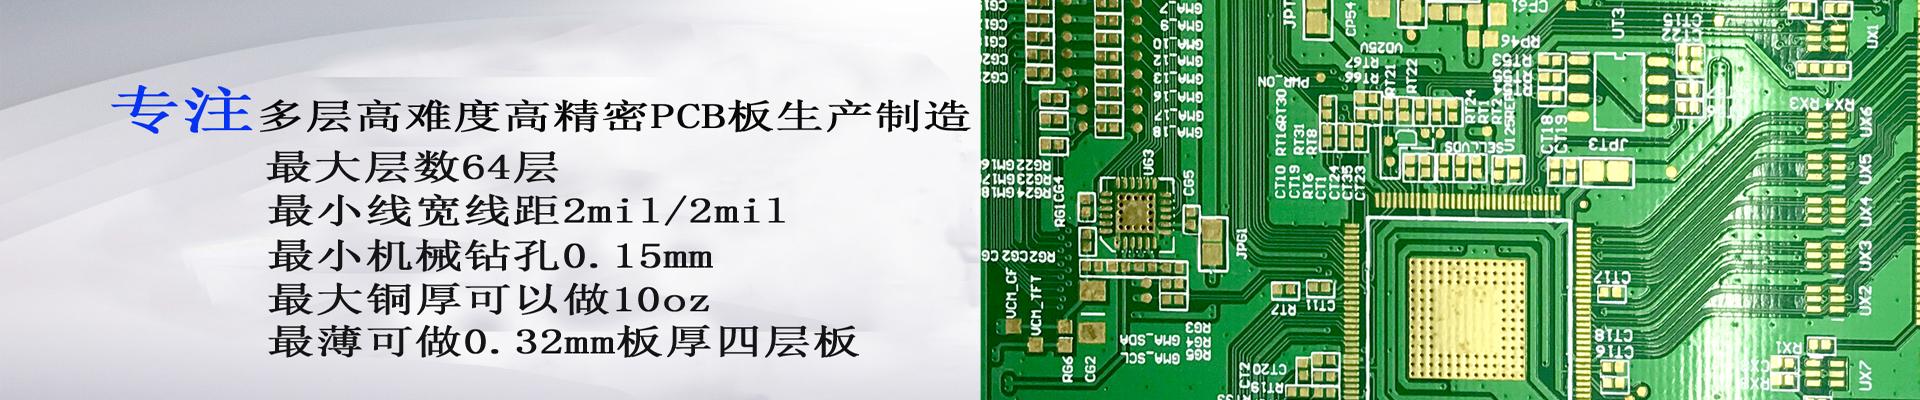 PCB四层板